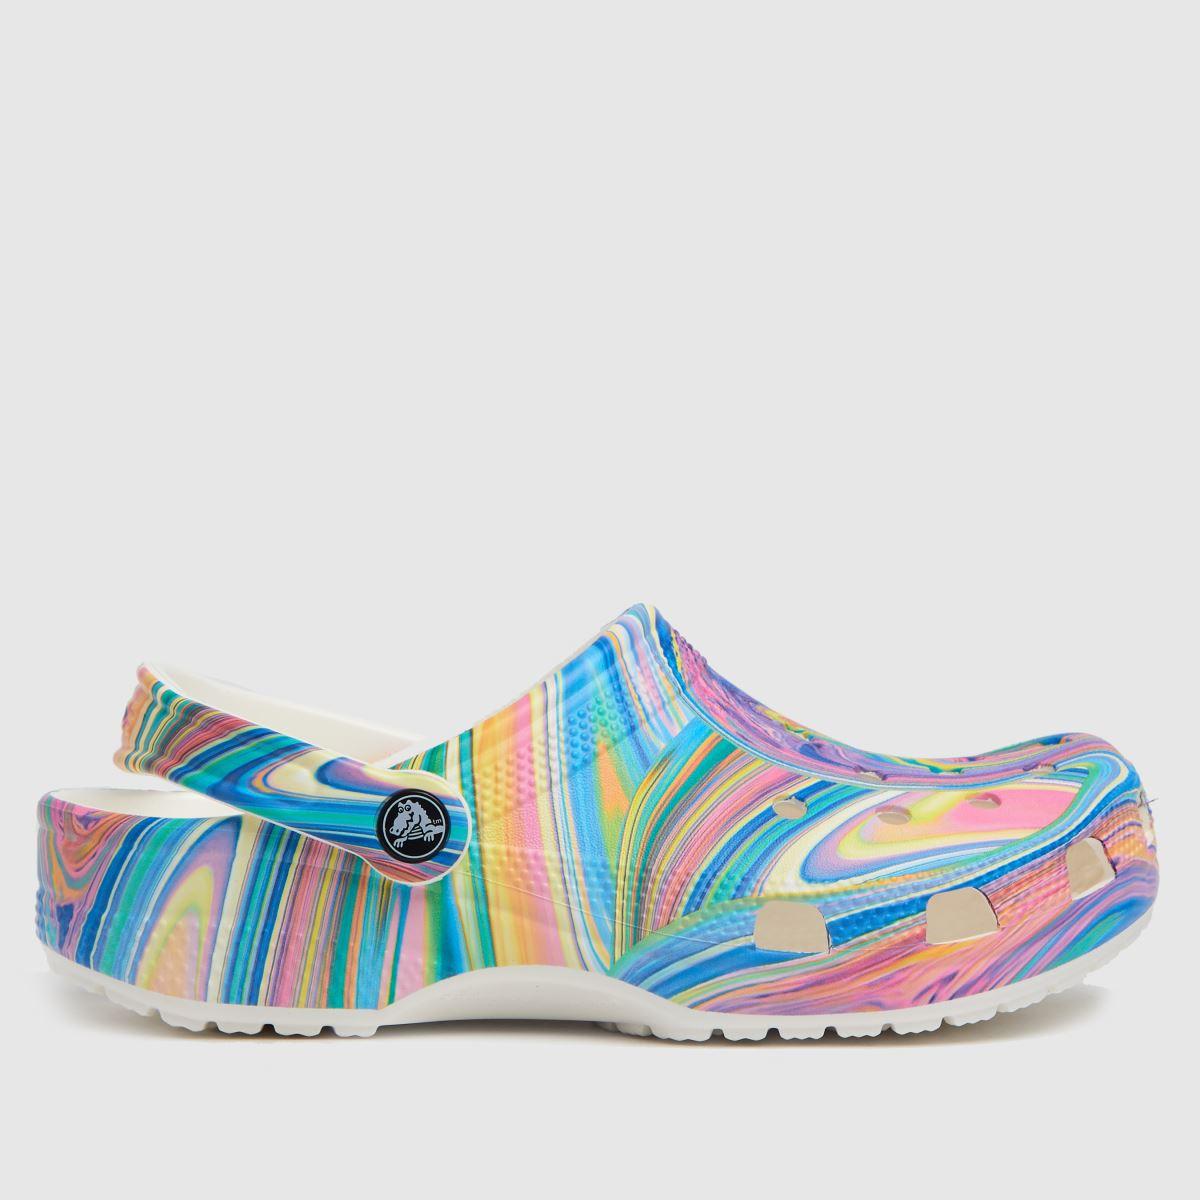 Crocs White & Pink Classic Clog Sandals